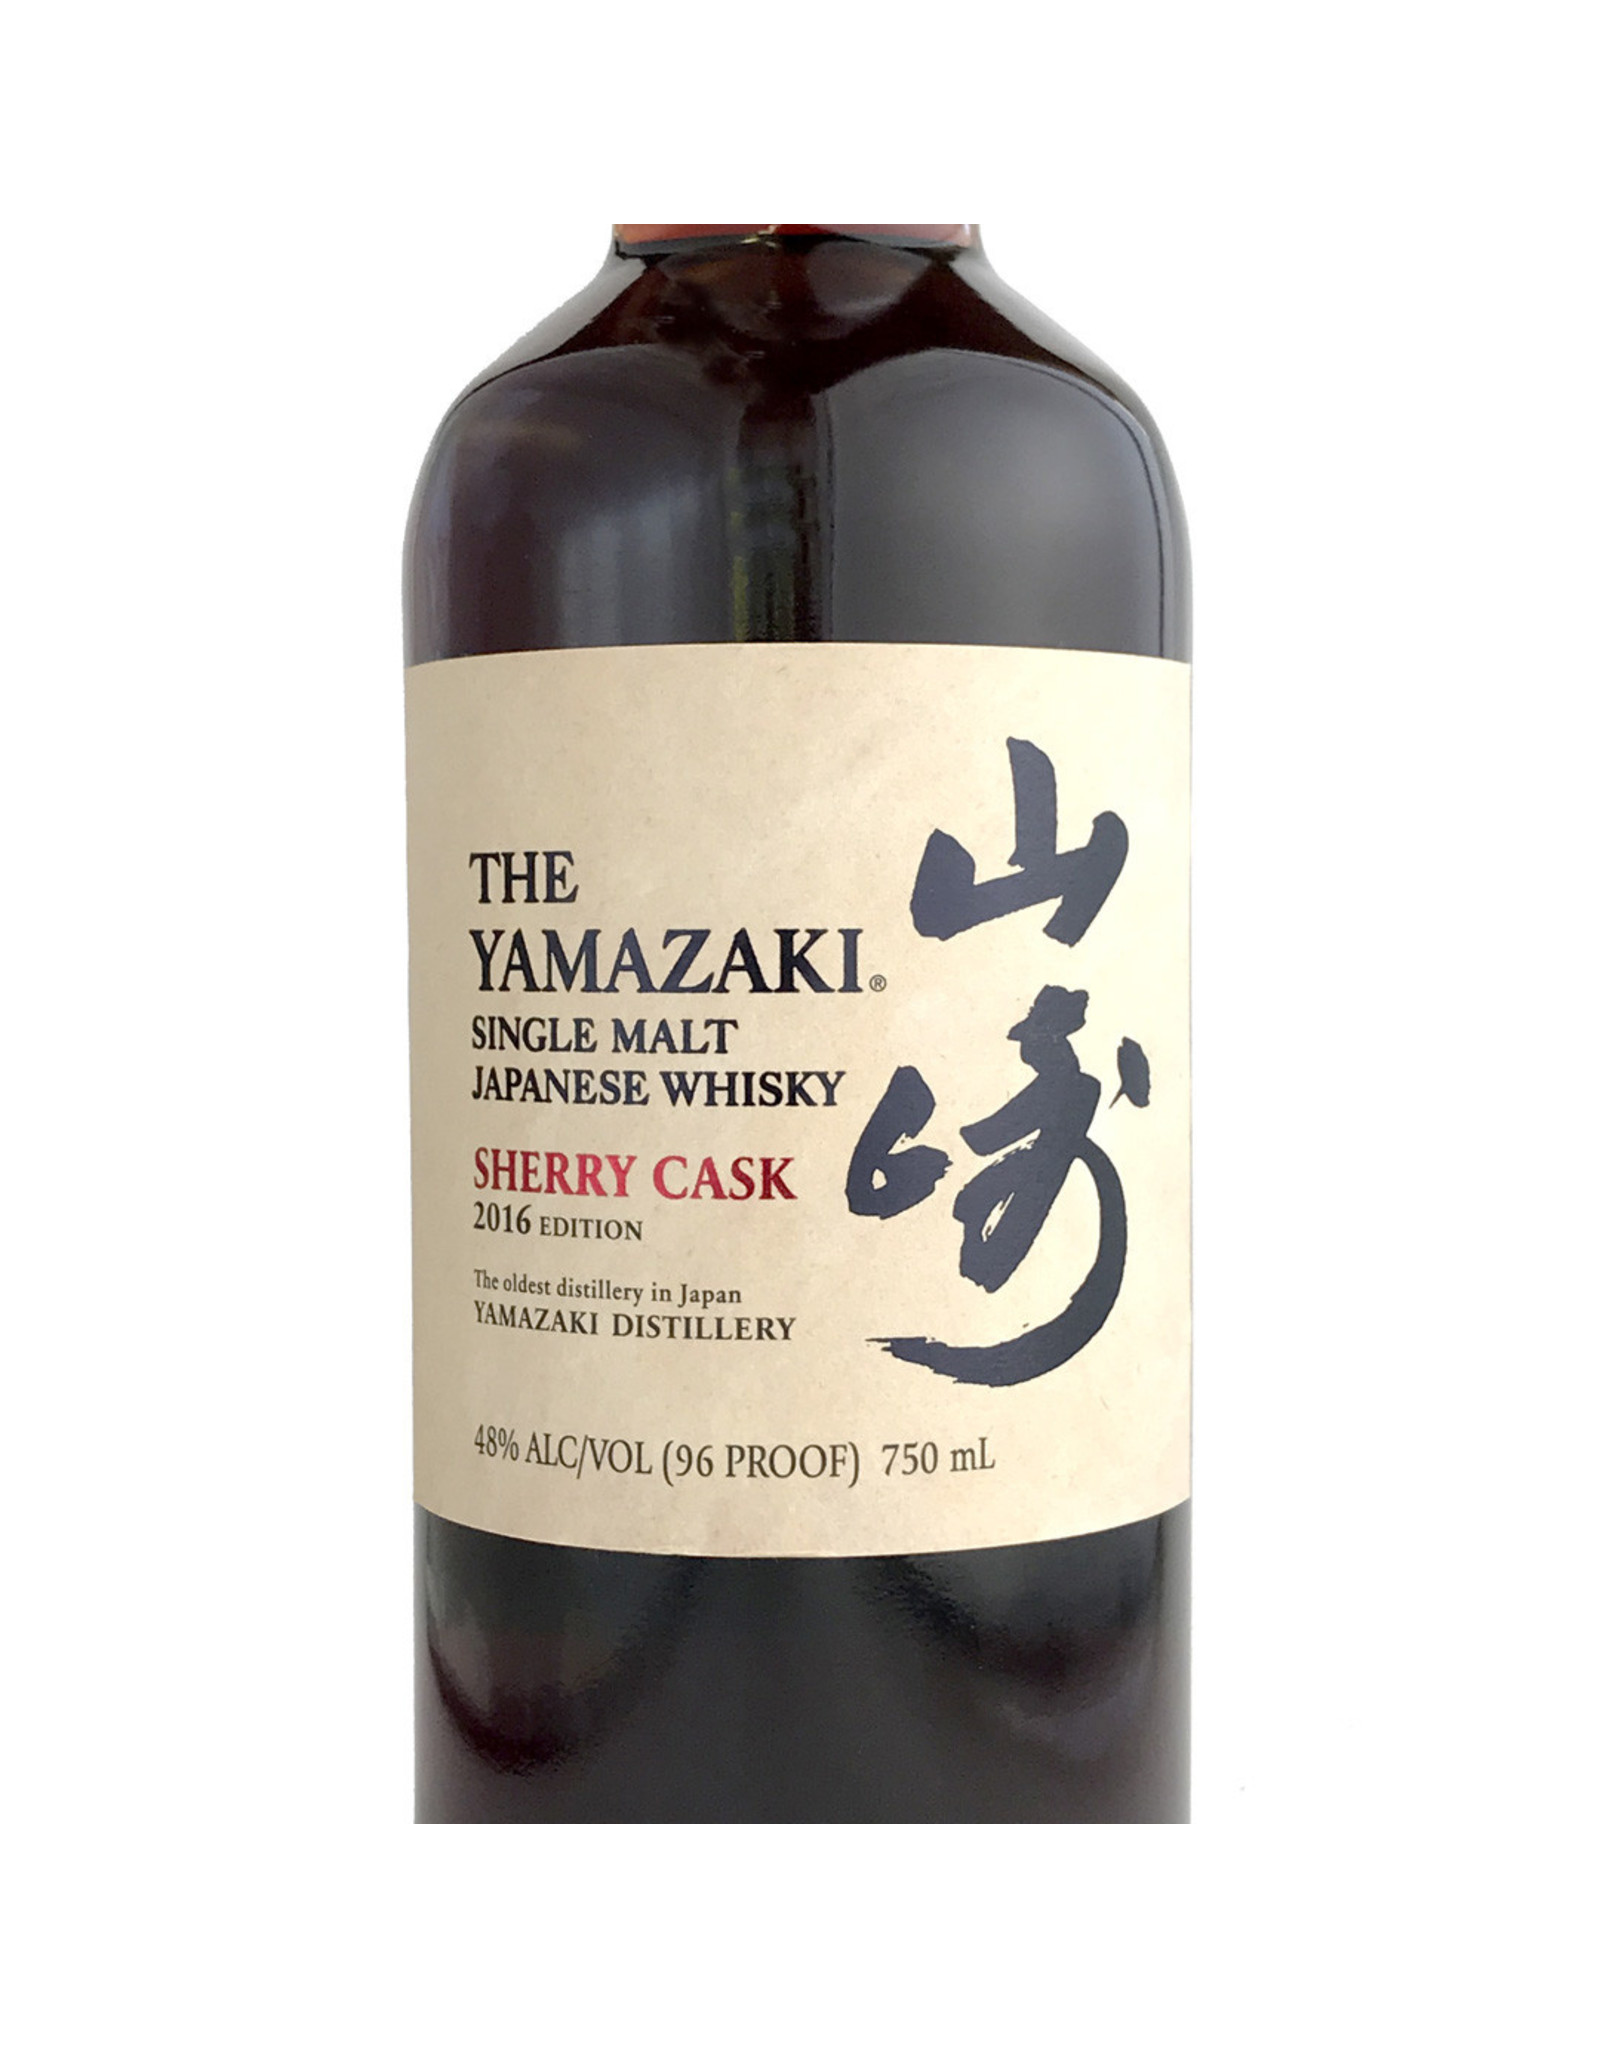 The Yamazaki Sherry Cask - The Cask of Yamazaki Single Malt Whisky 2016